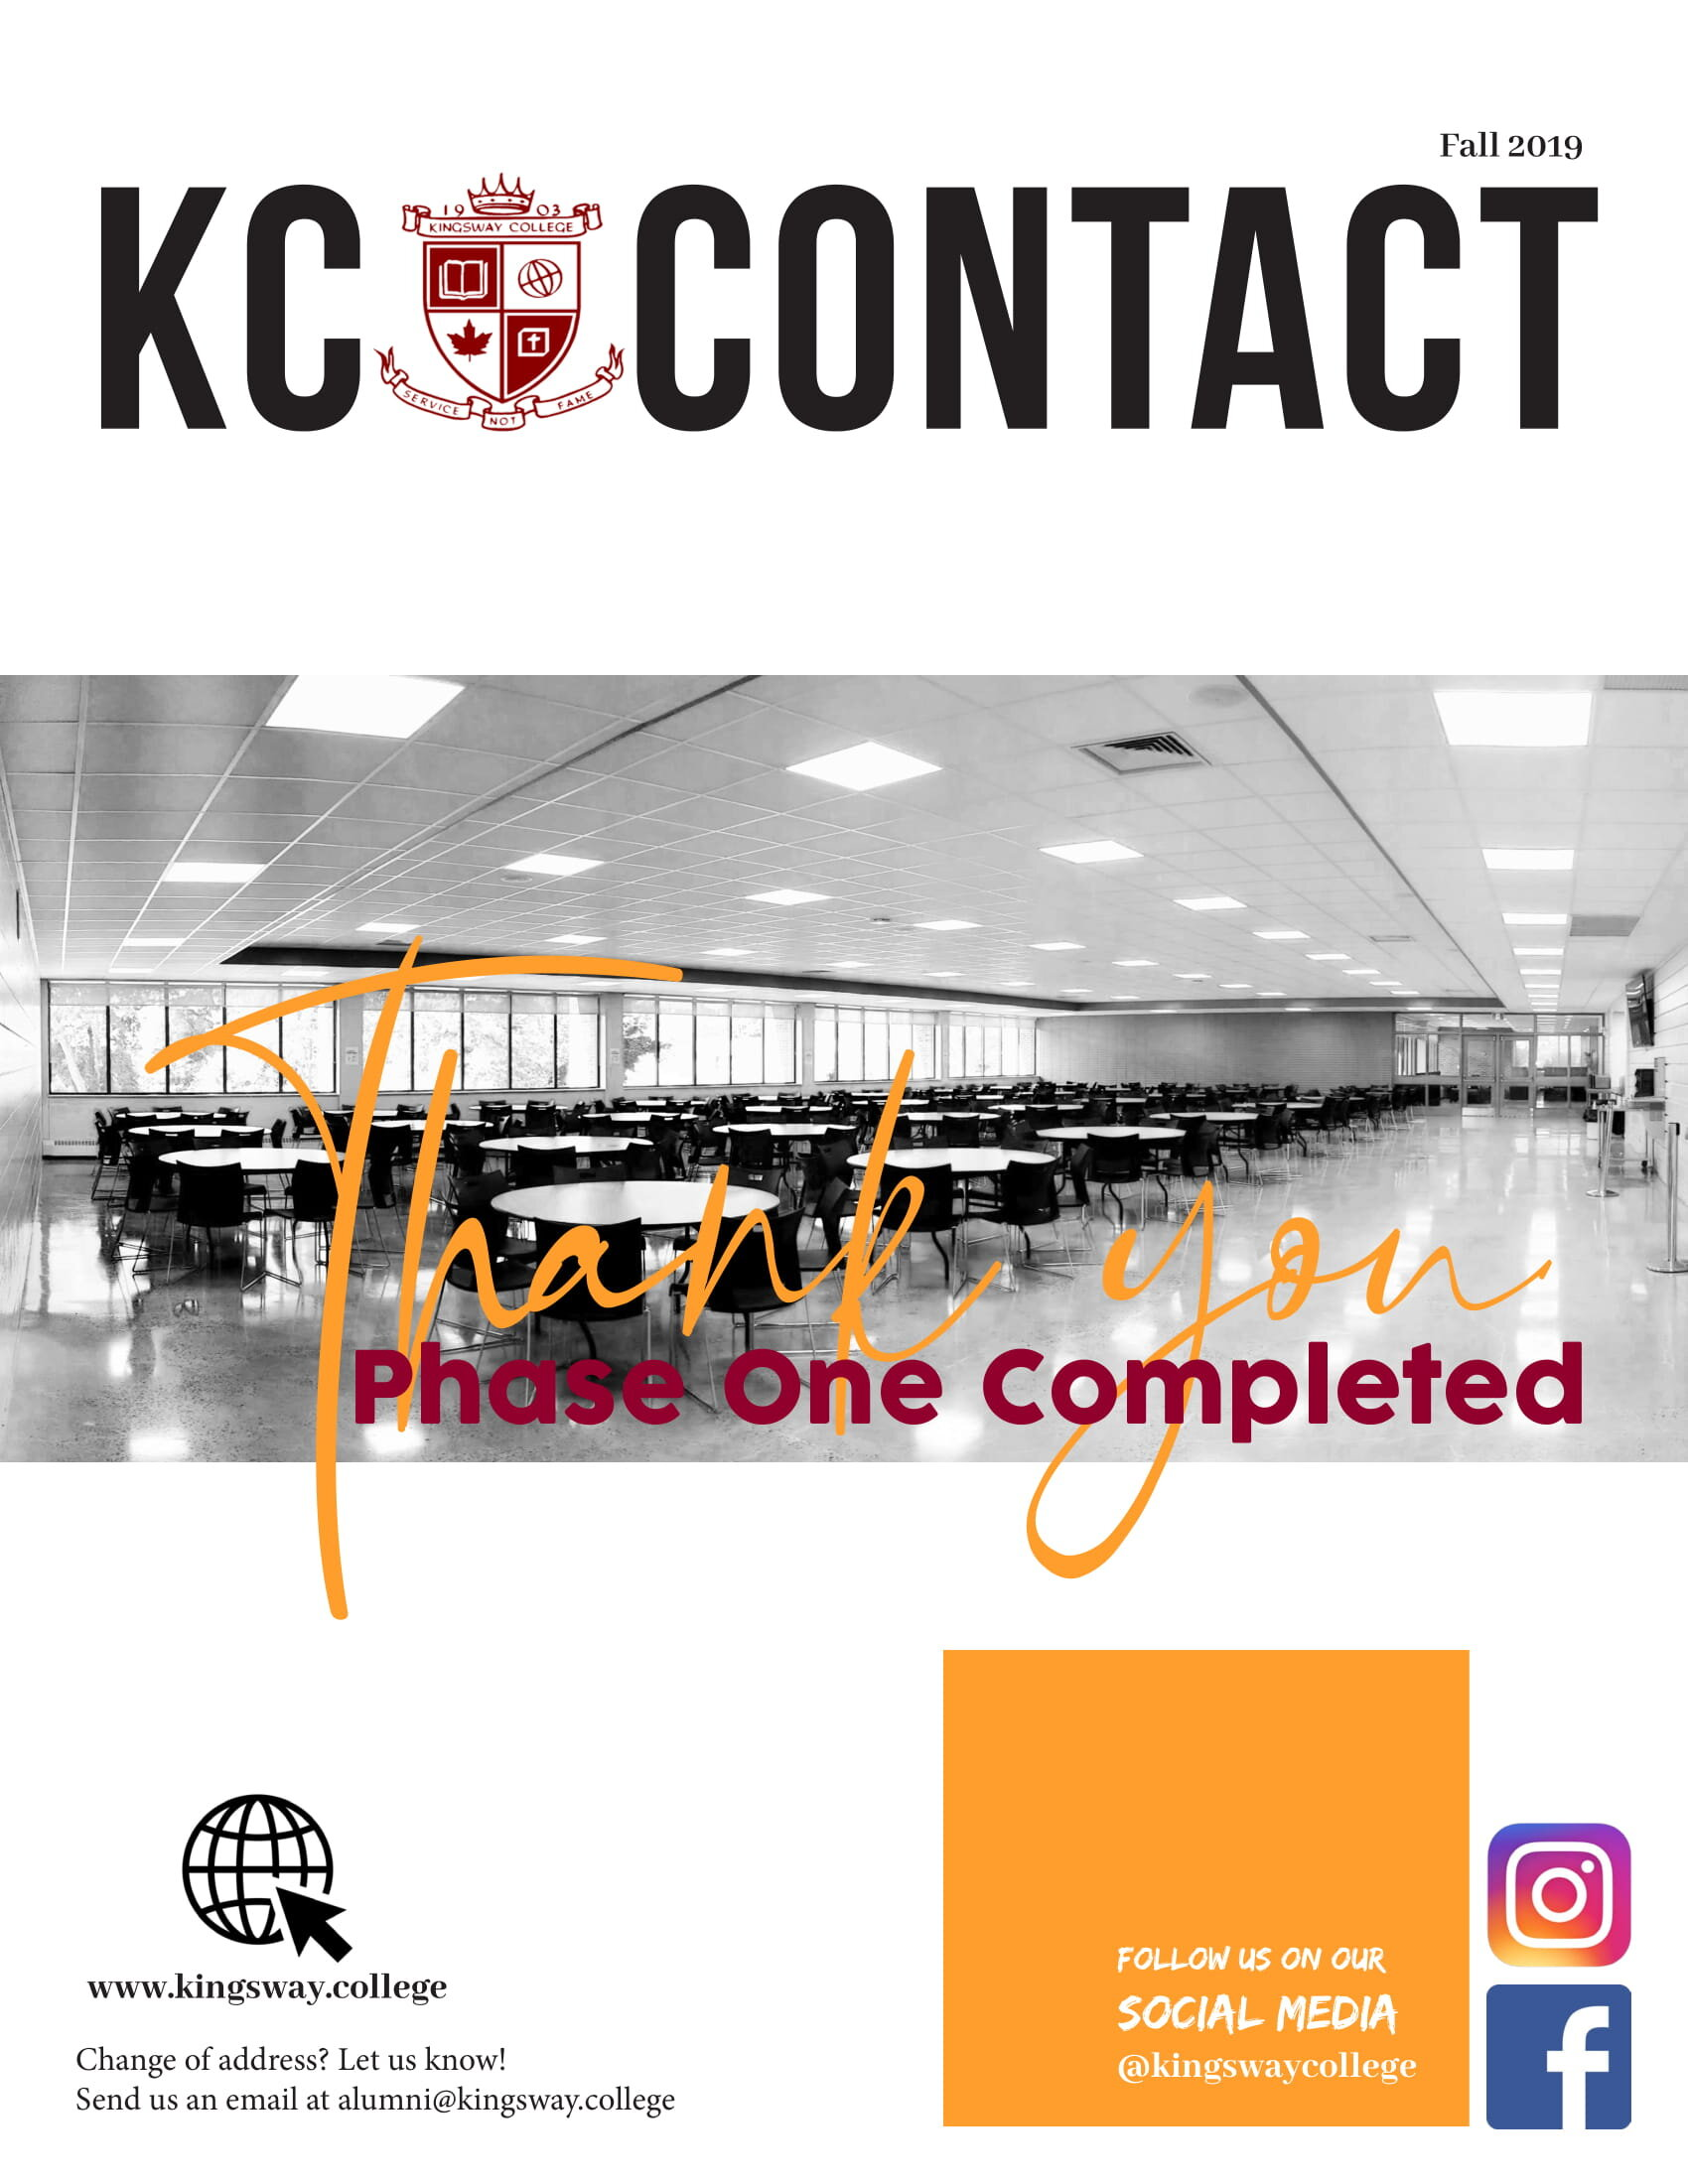 KC Contact Fall 2019-01.jpg